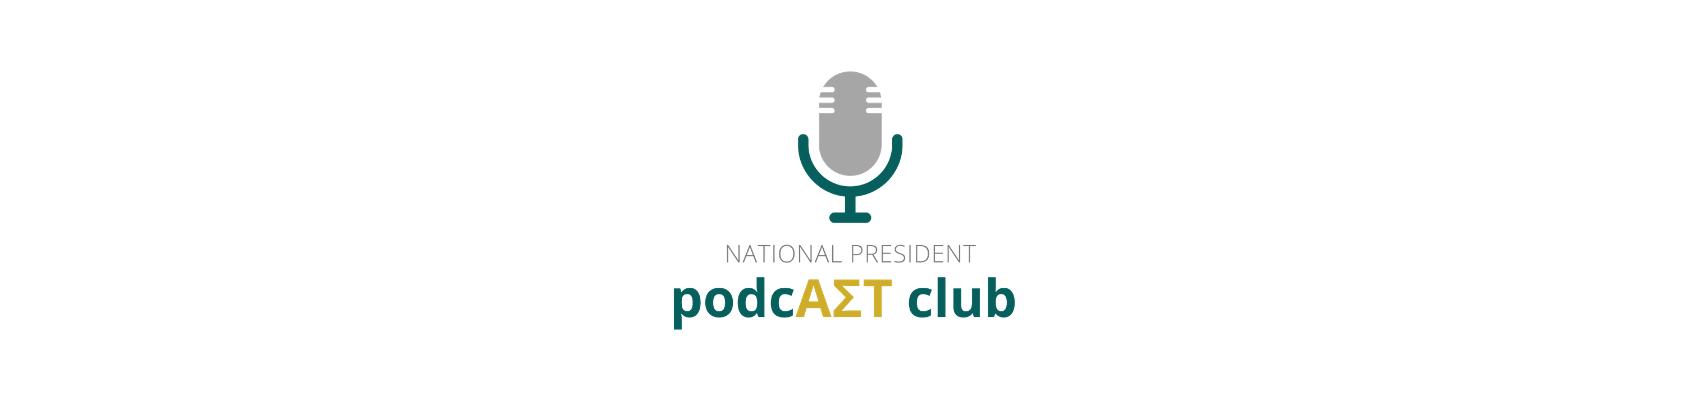 Logo for National President Podcast Club